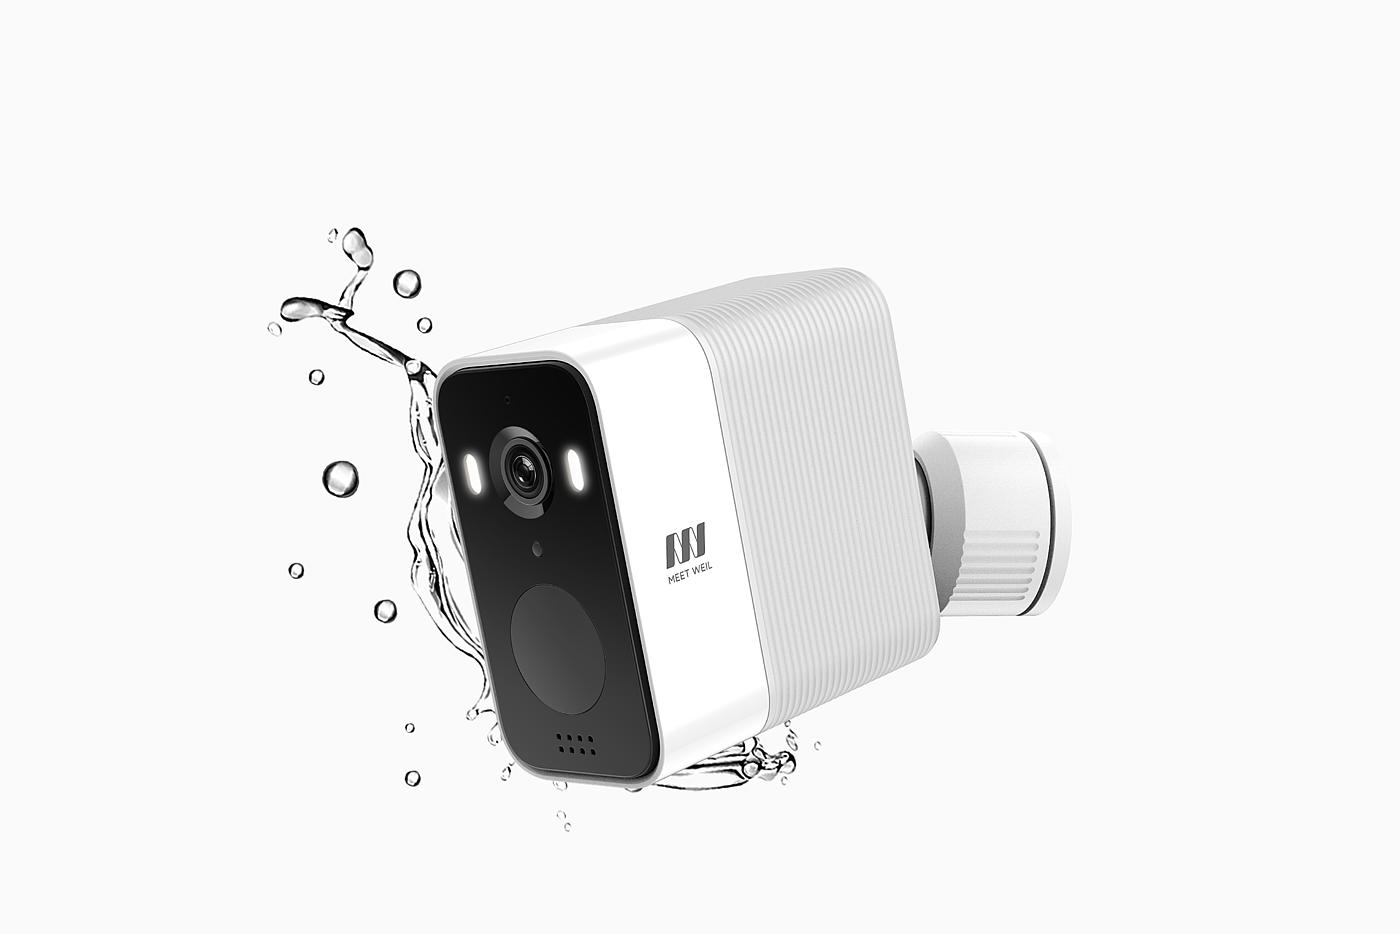 SECURITY,Wireless,Outdoor,安防,无线相机,IOT,camera,电池相机,